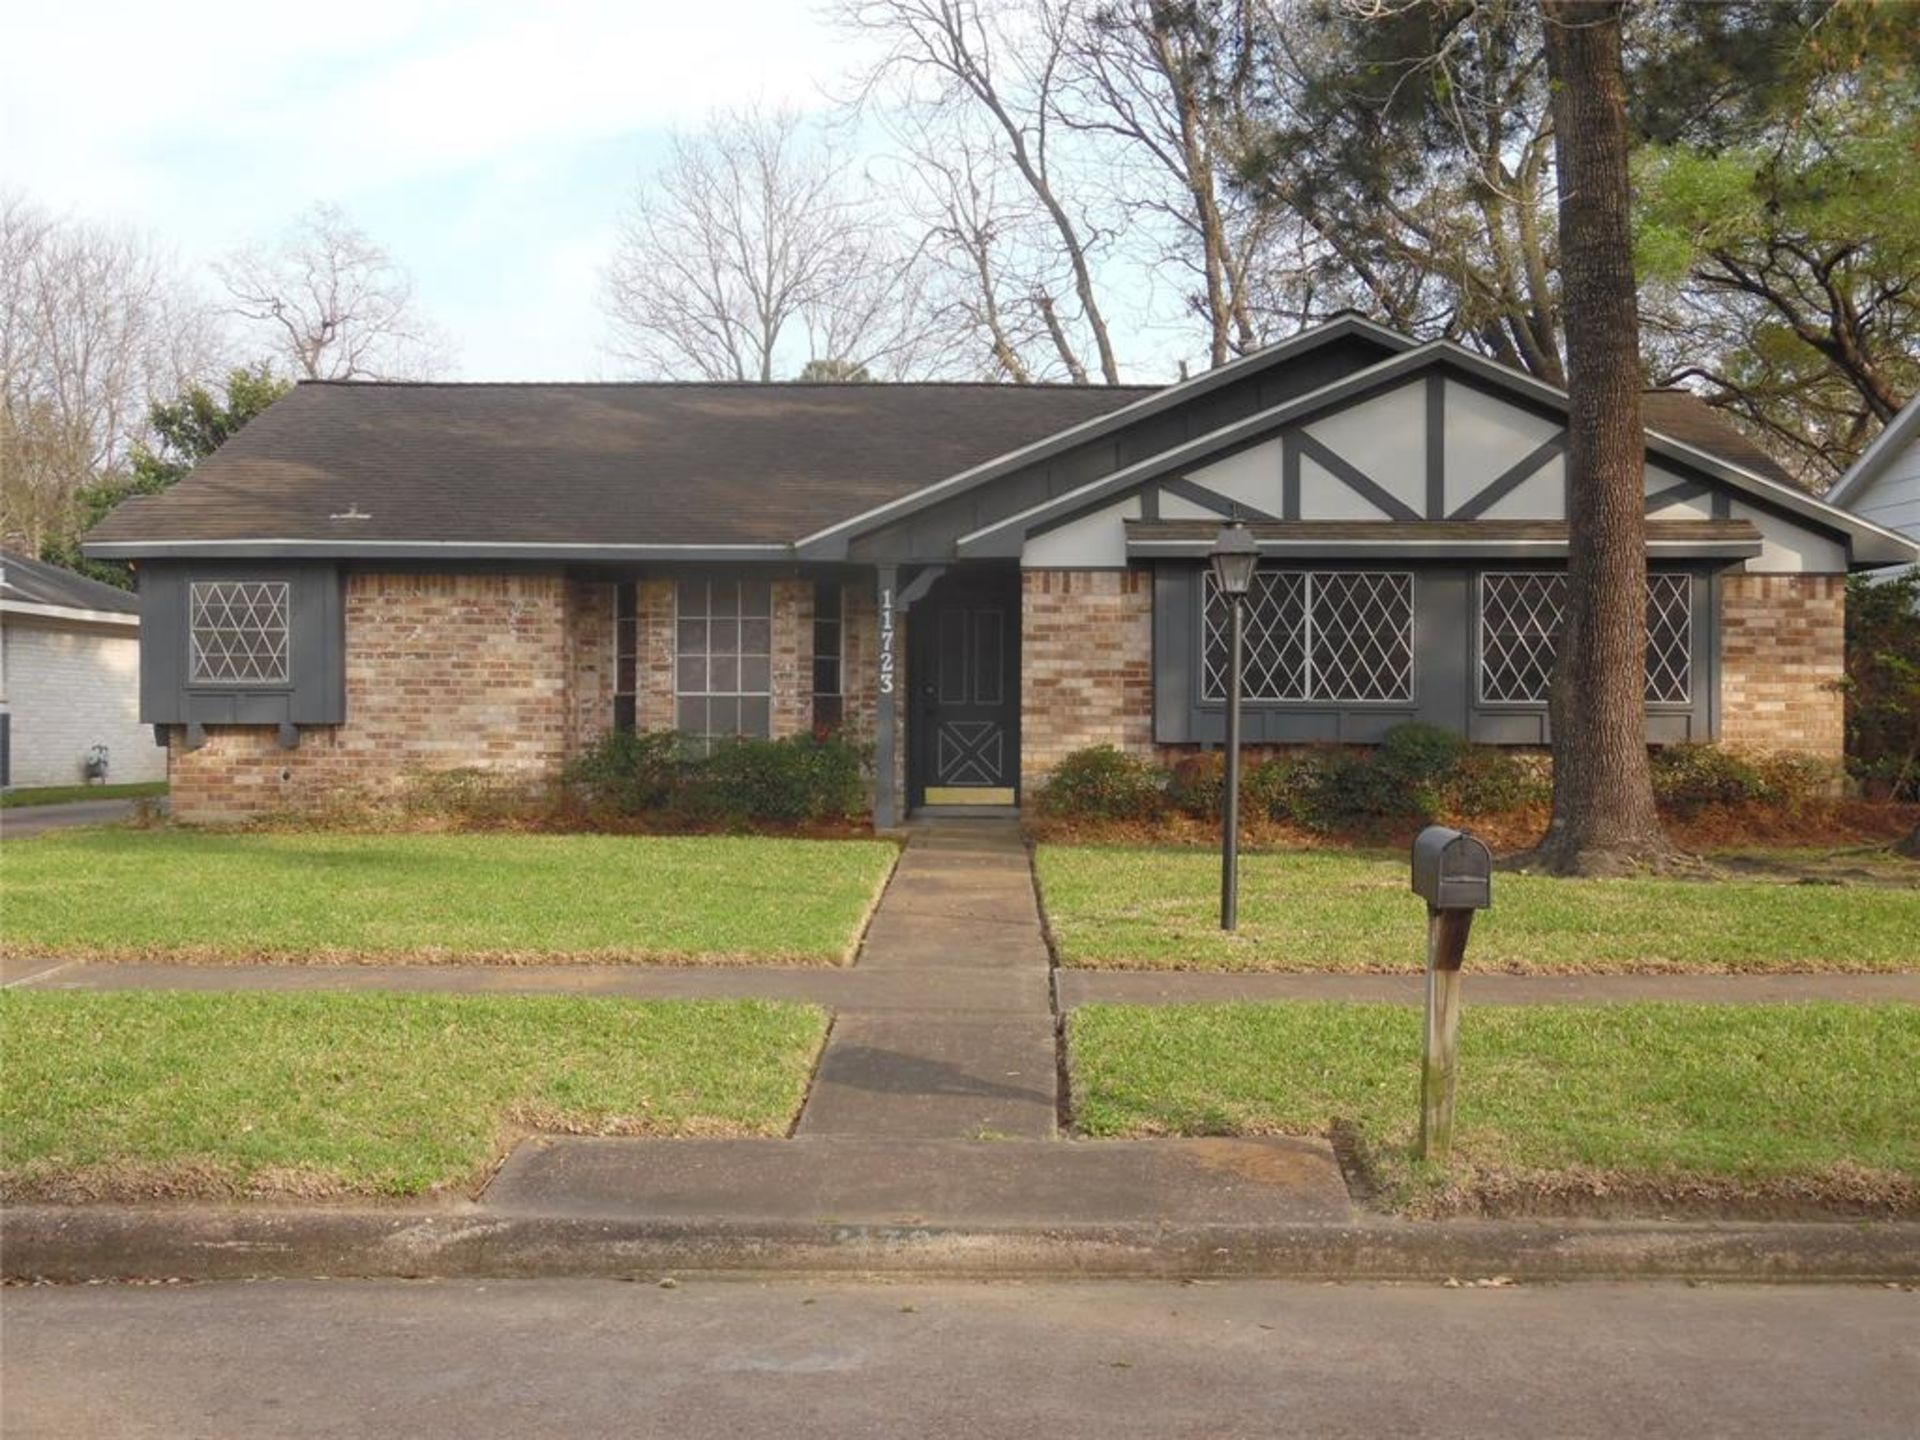 Houses For Sale In Houston: 11723 N Kensington, TX 77031